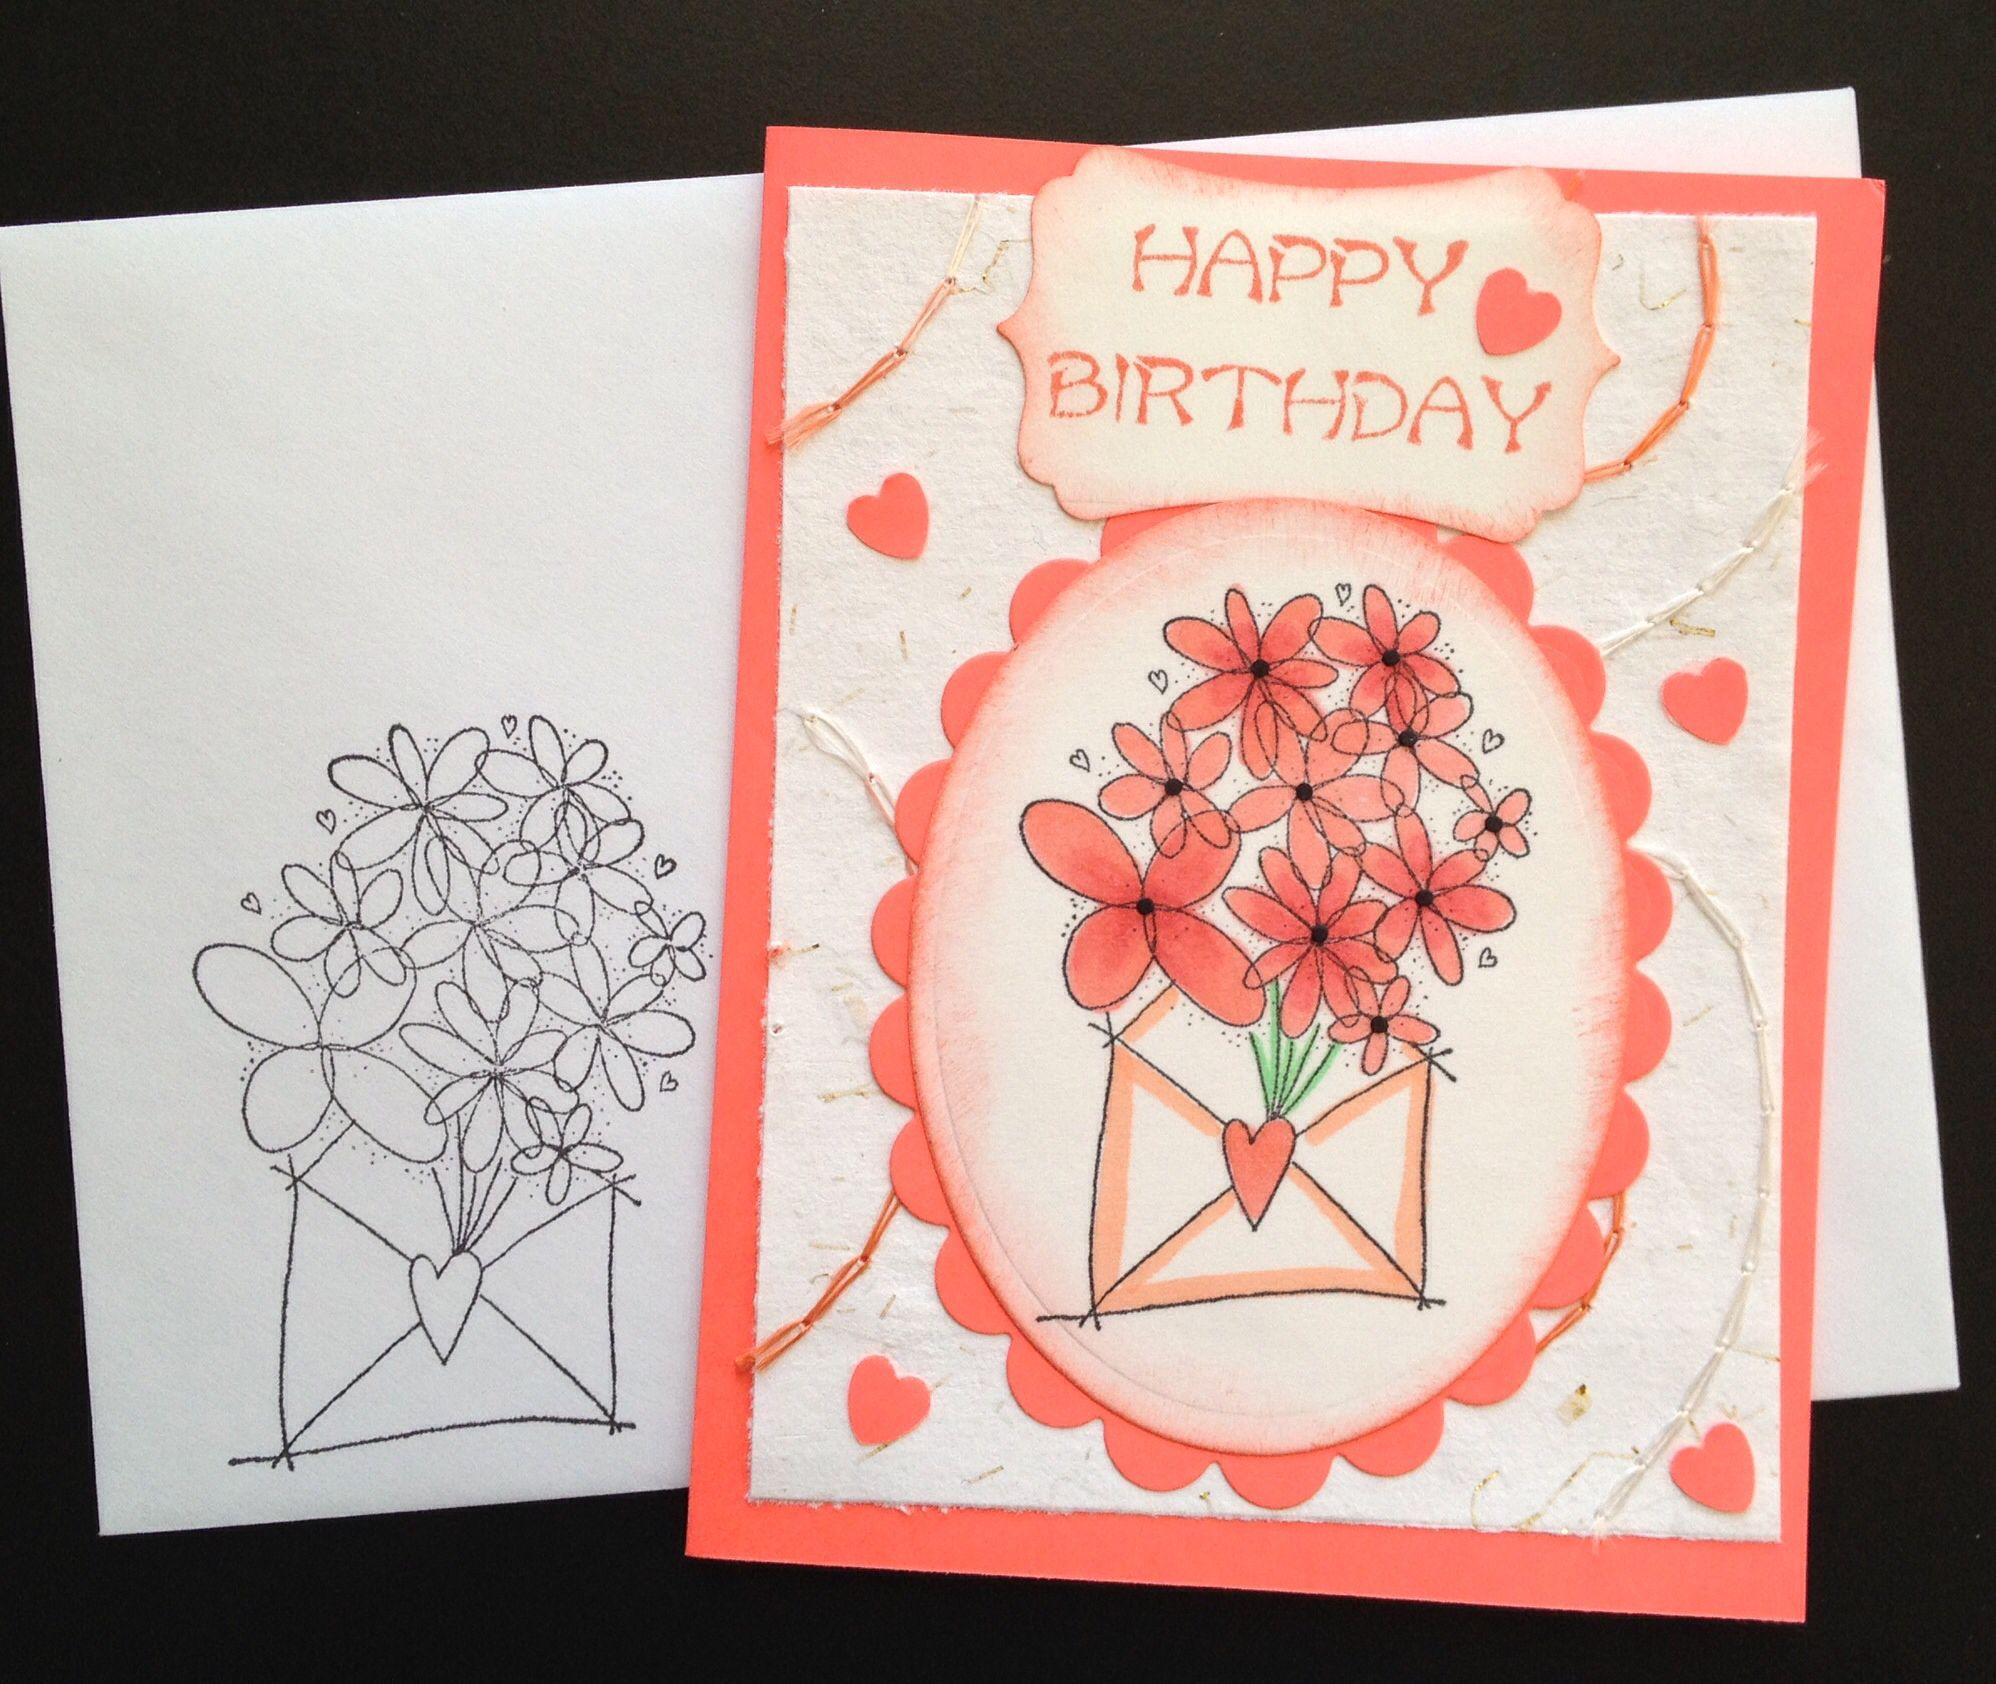 Pin By Rosie Owens On Cards By Rosie Owens